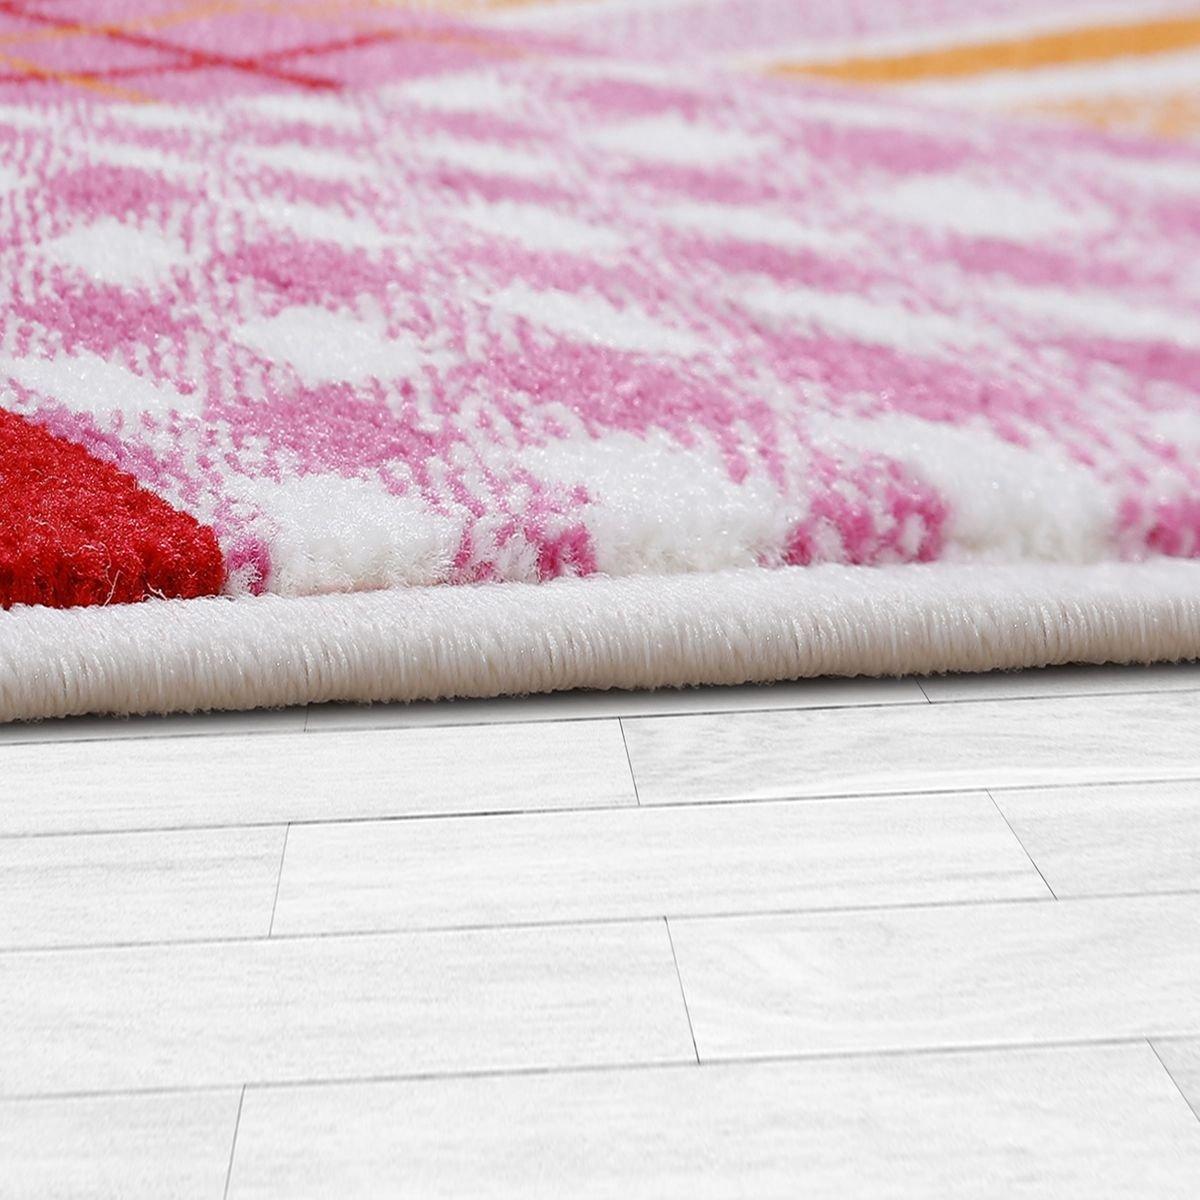 T&T Design Kinderzimmer Teppich Kariert Bunte Eulen Kurzflor Pink ...